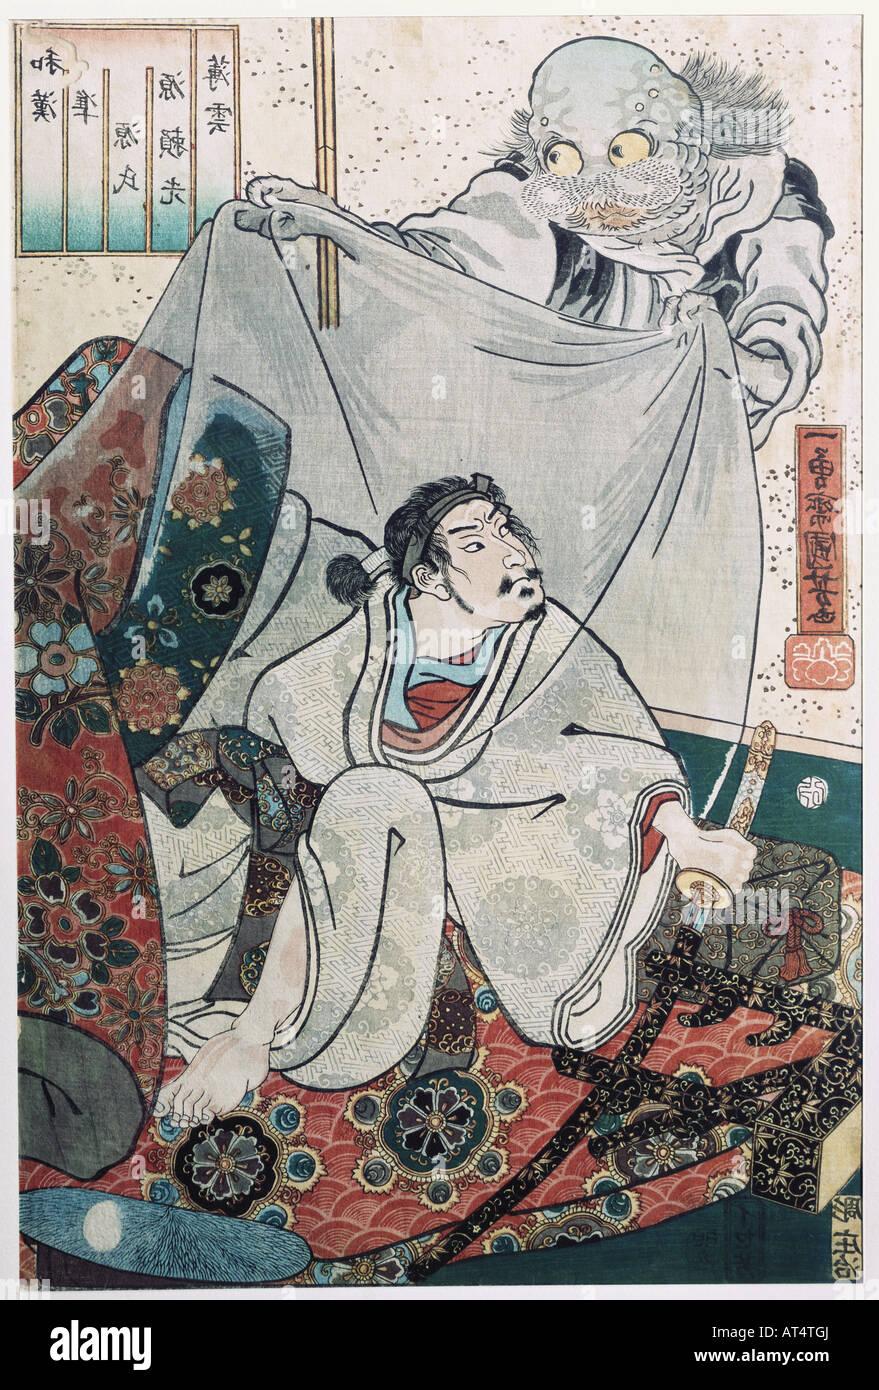 fine arts, Kuniyoshi, Utagawa, (1798 - 1861), 'Minomoto Raiko and the earth spider', coloured woodcut, Japan, - Stock Image